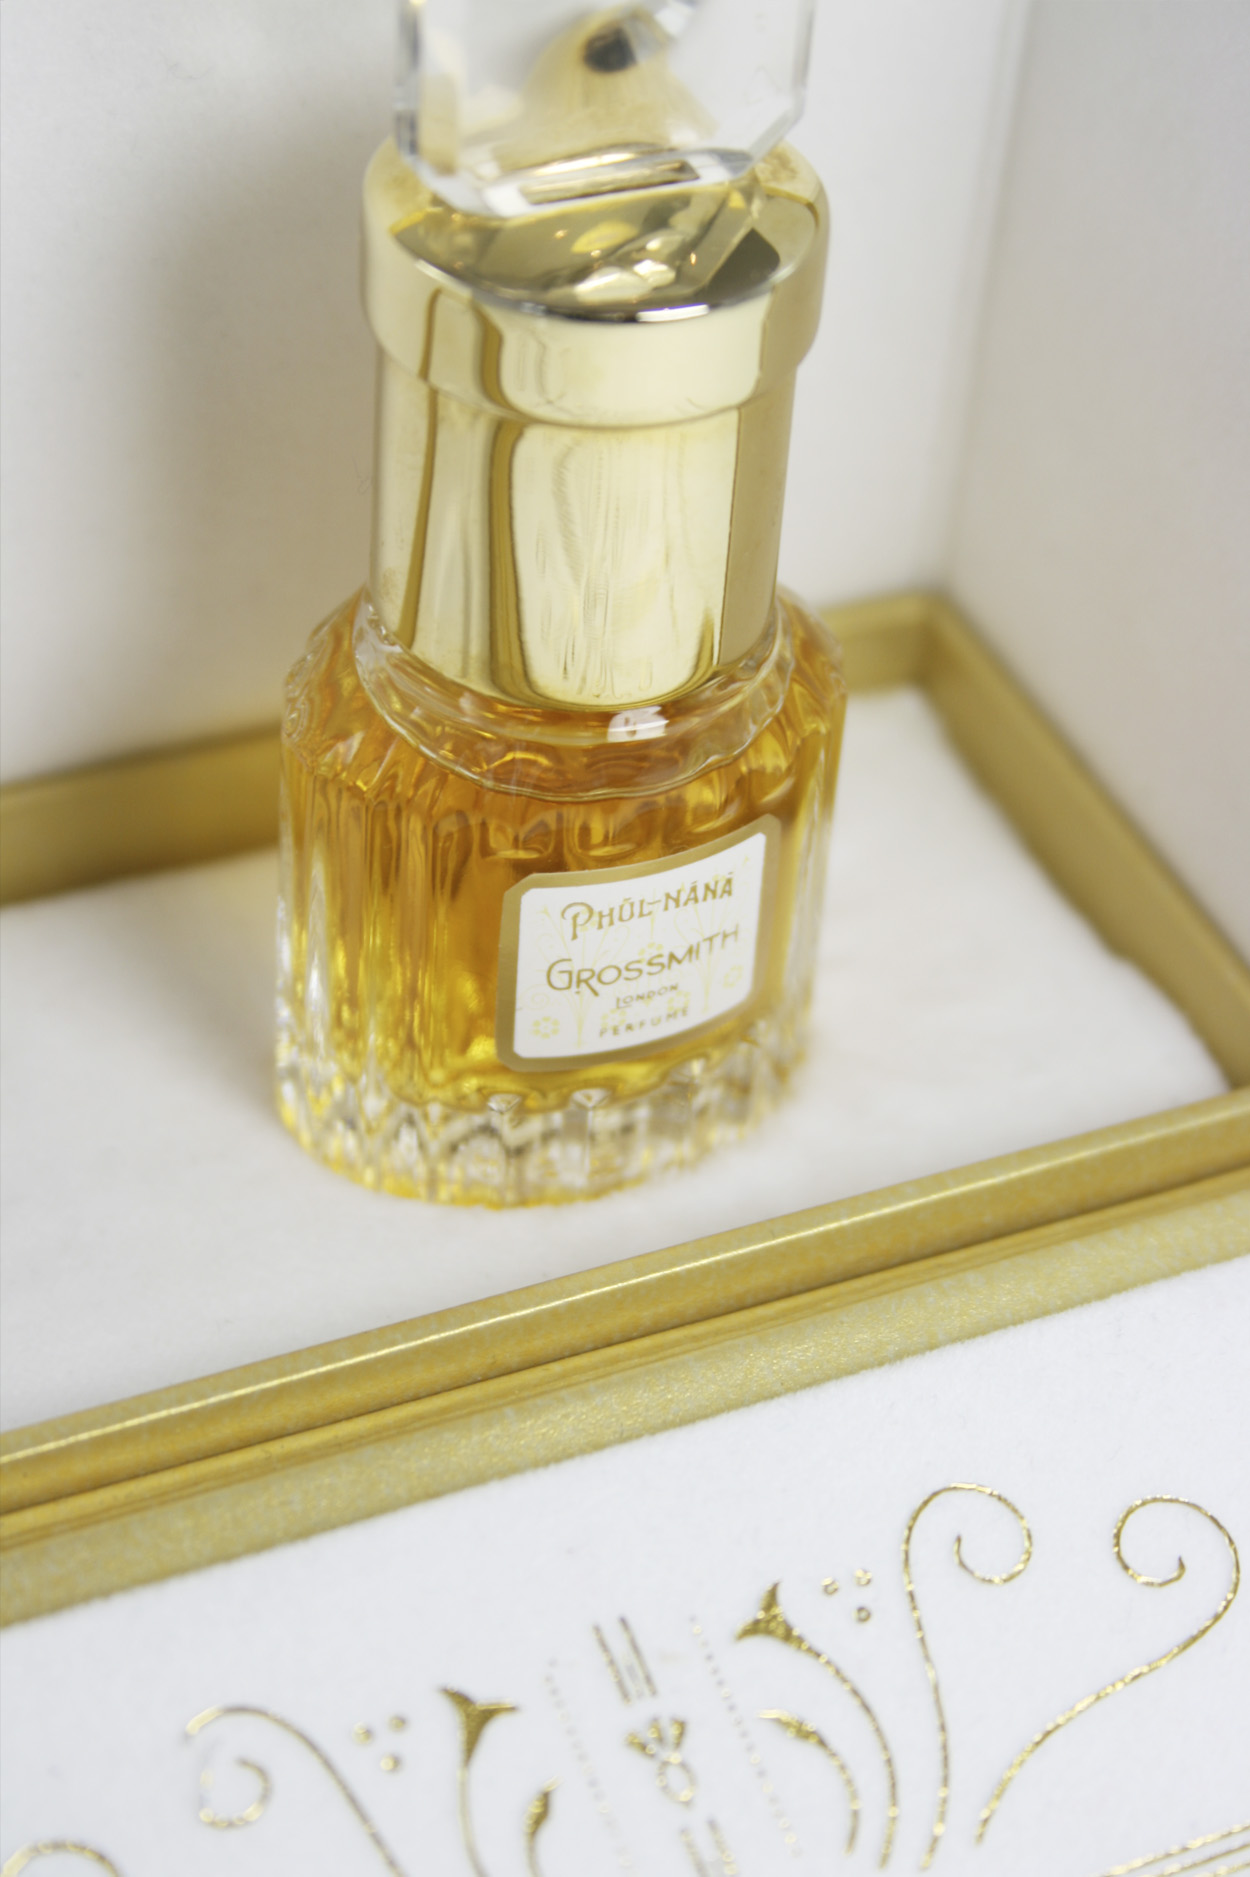 Grossmith_Phul-Nana_10ml Perfume.jpg